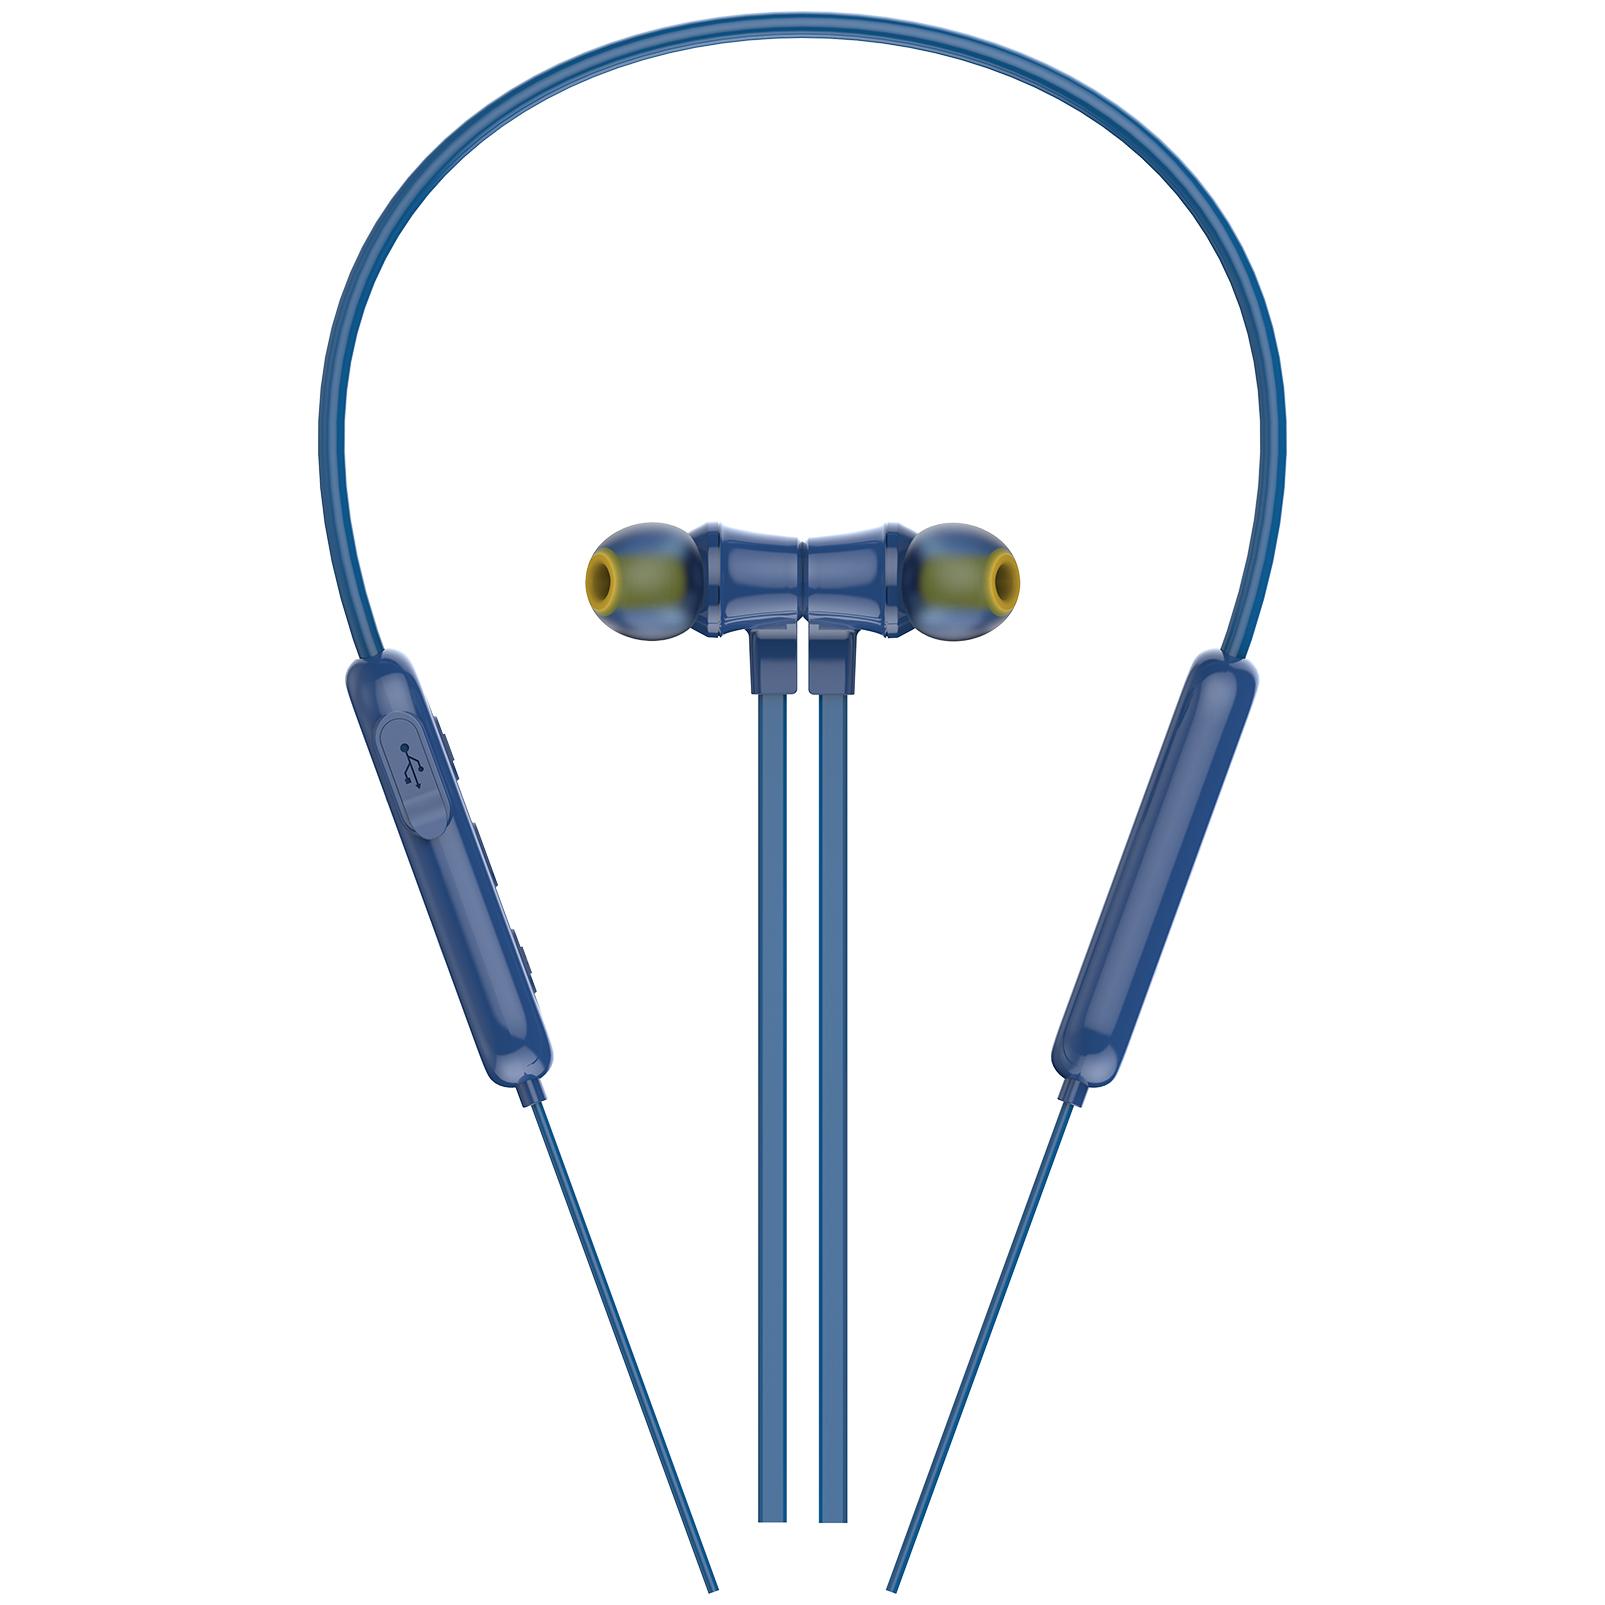 INFINITY GLIDE N100 - Blue - In-Ear Ultra Light Neckband - Detailshot 1